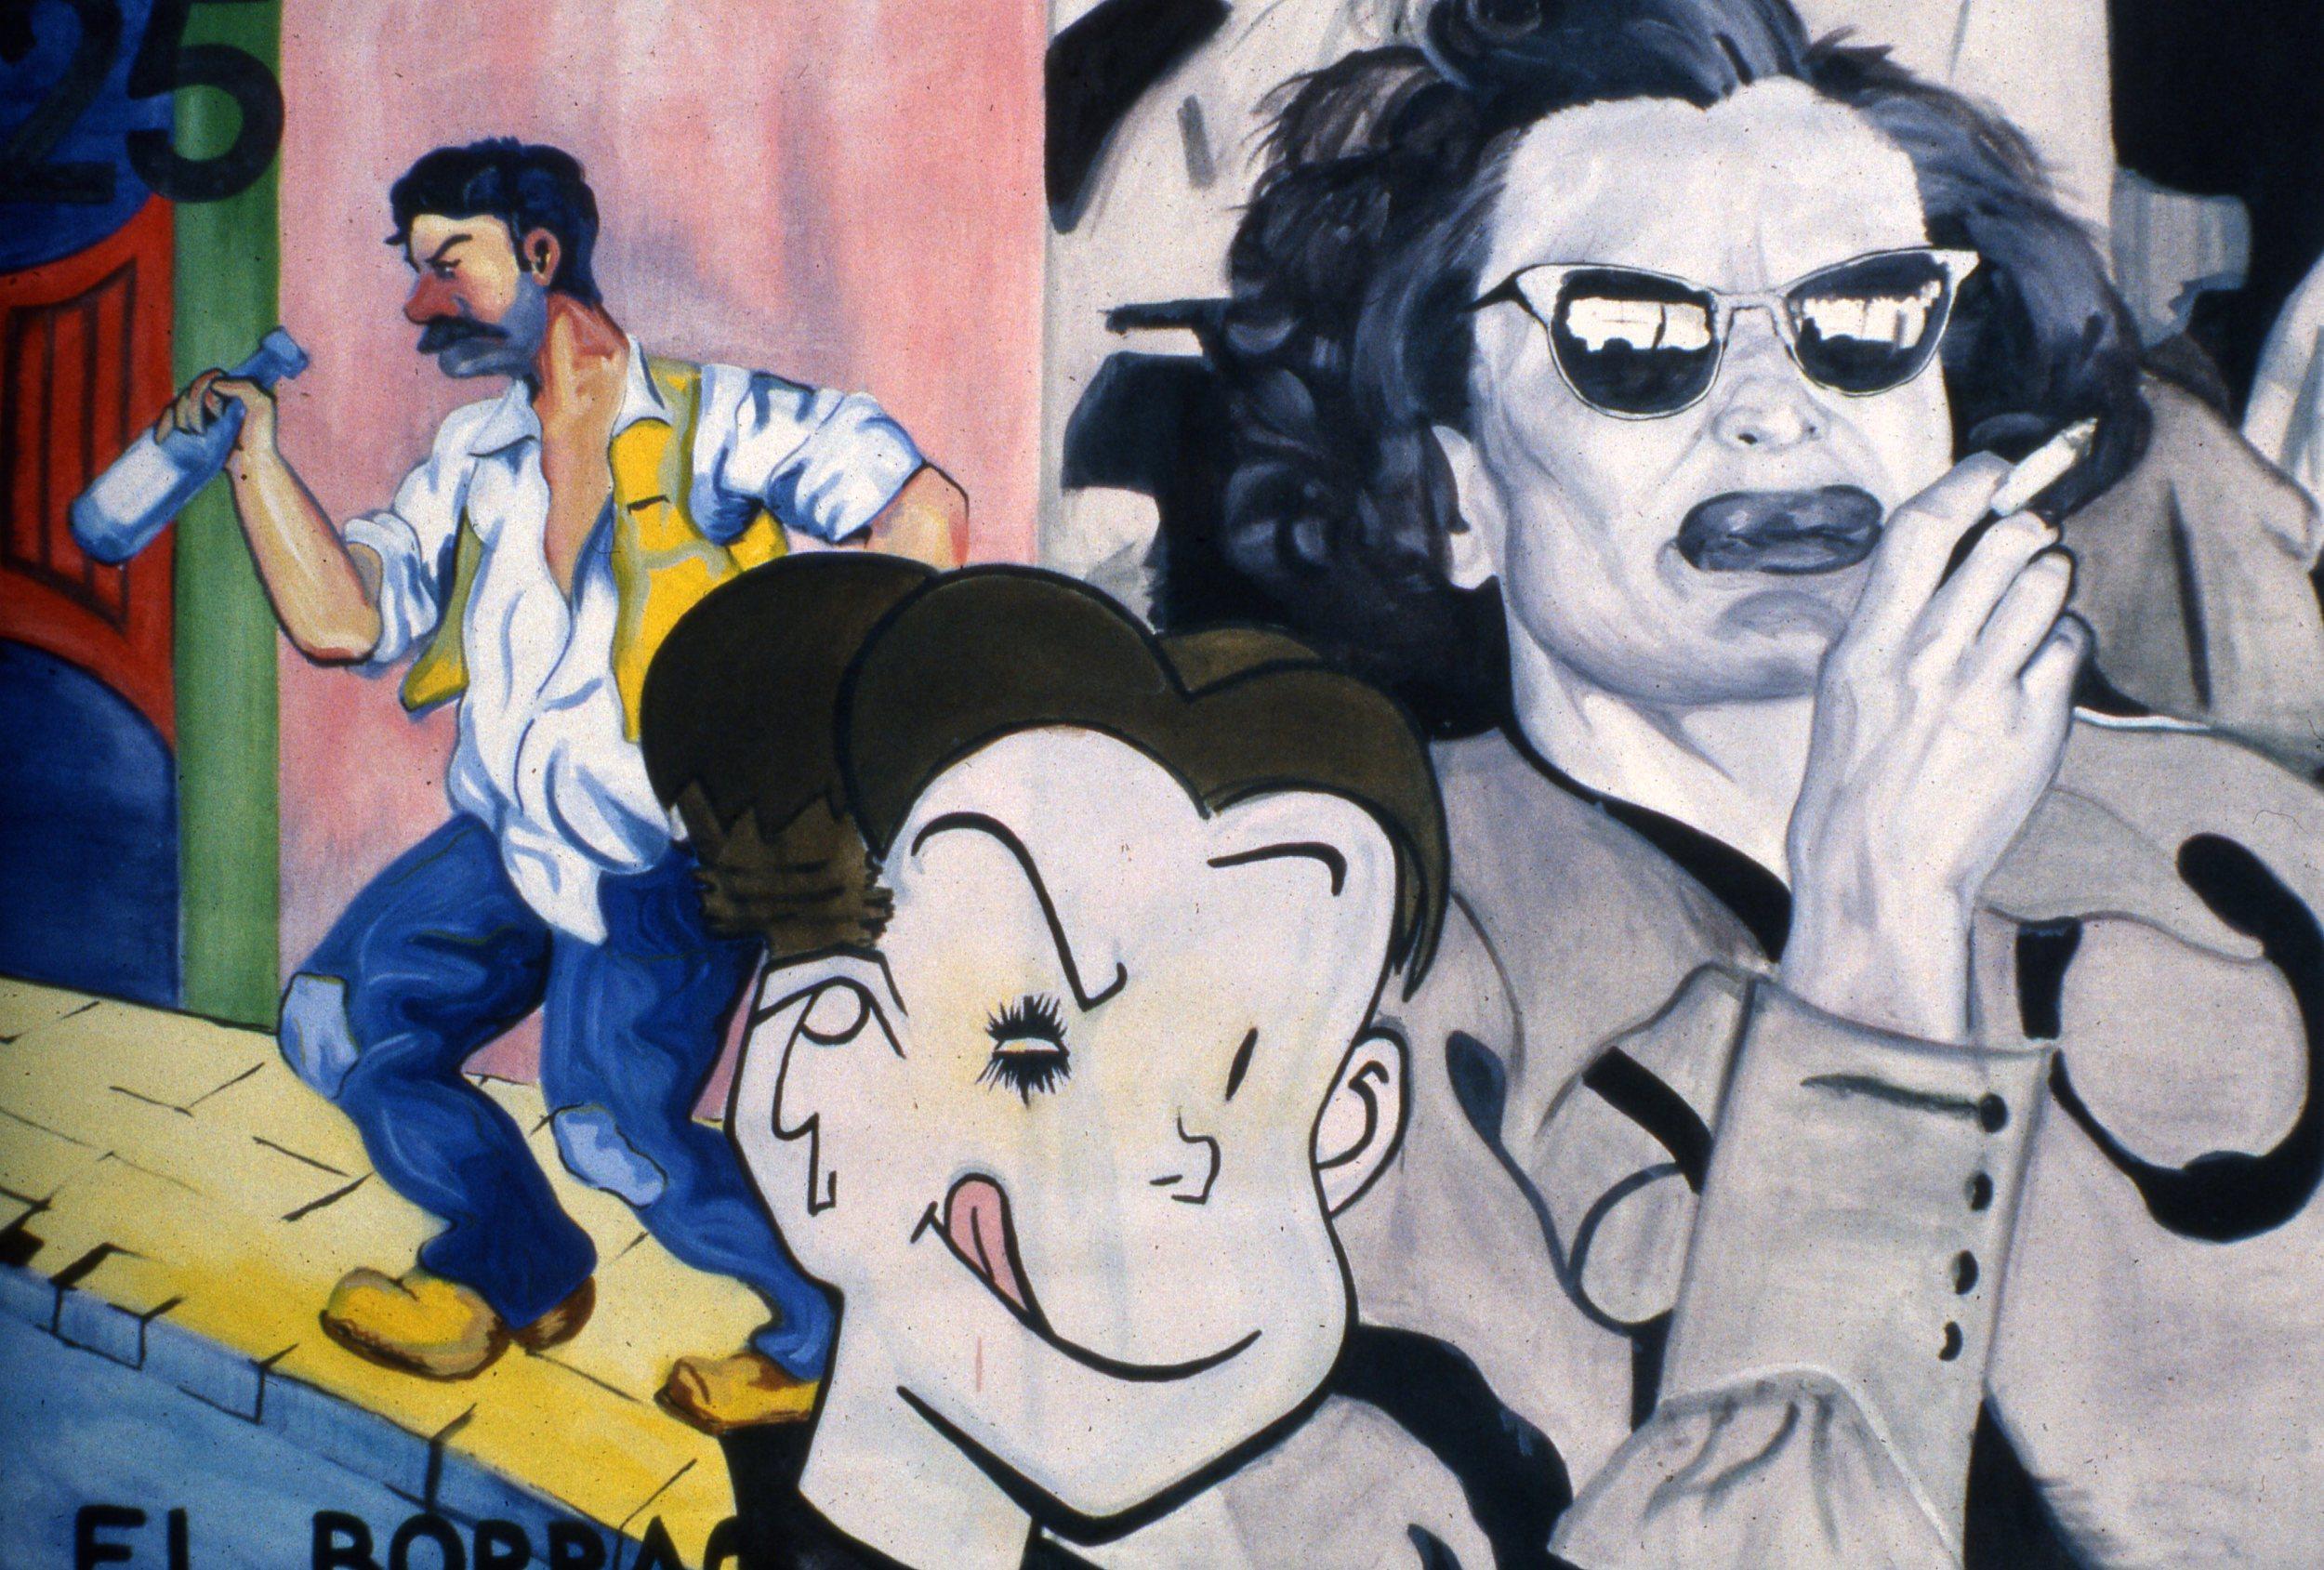 "El Borracho, oil on canvas, 32"" x 42"", 1997"